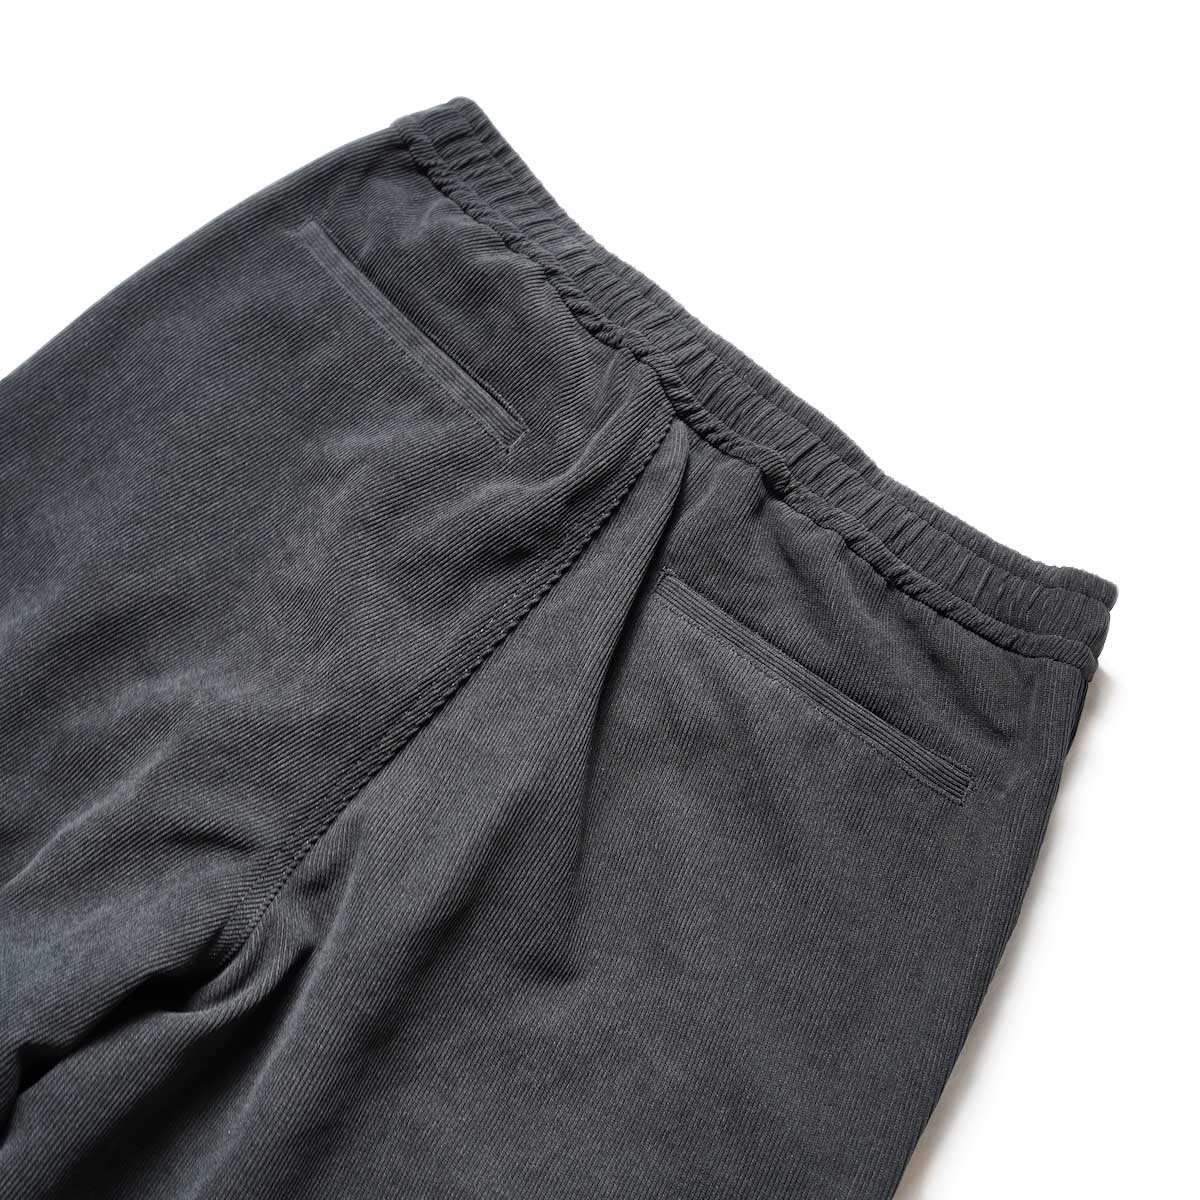 DAIWA PIER39 / TECH CORDUROY EASY TROUSERS (Black)ヒップポケット